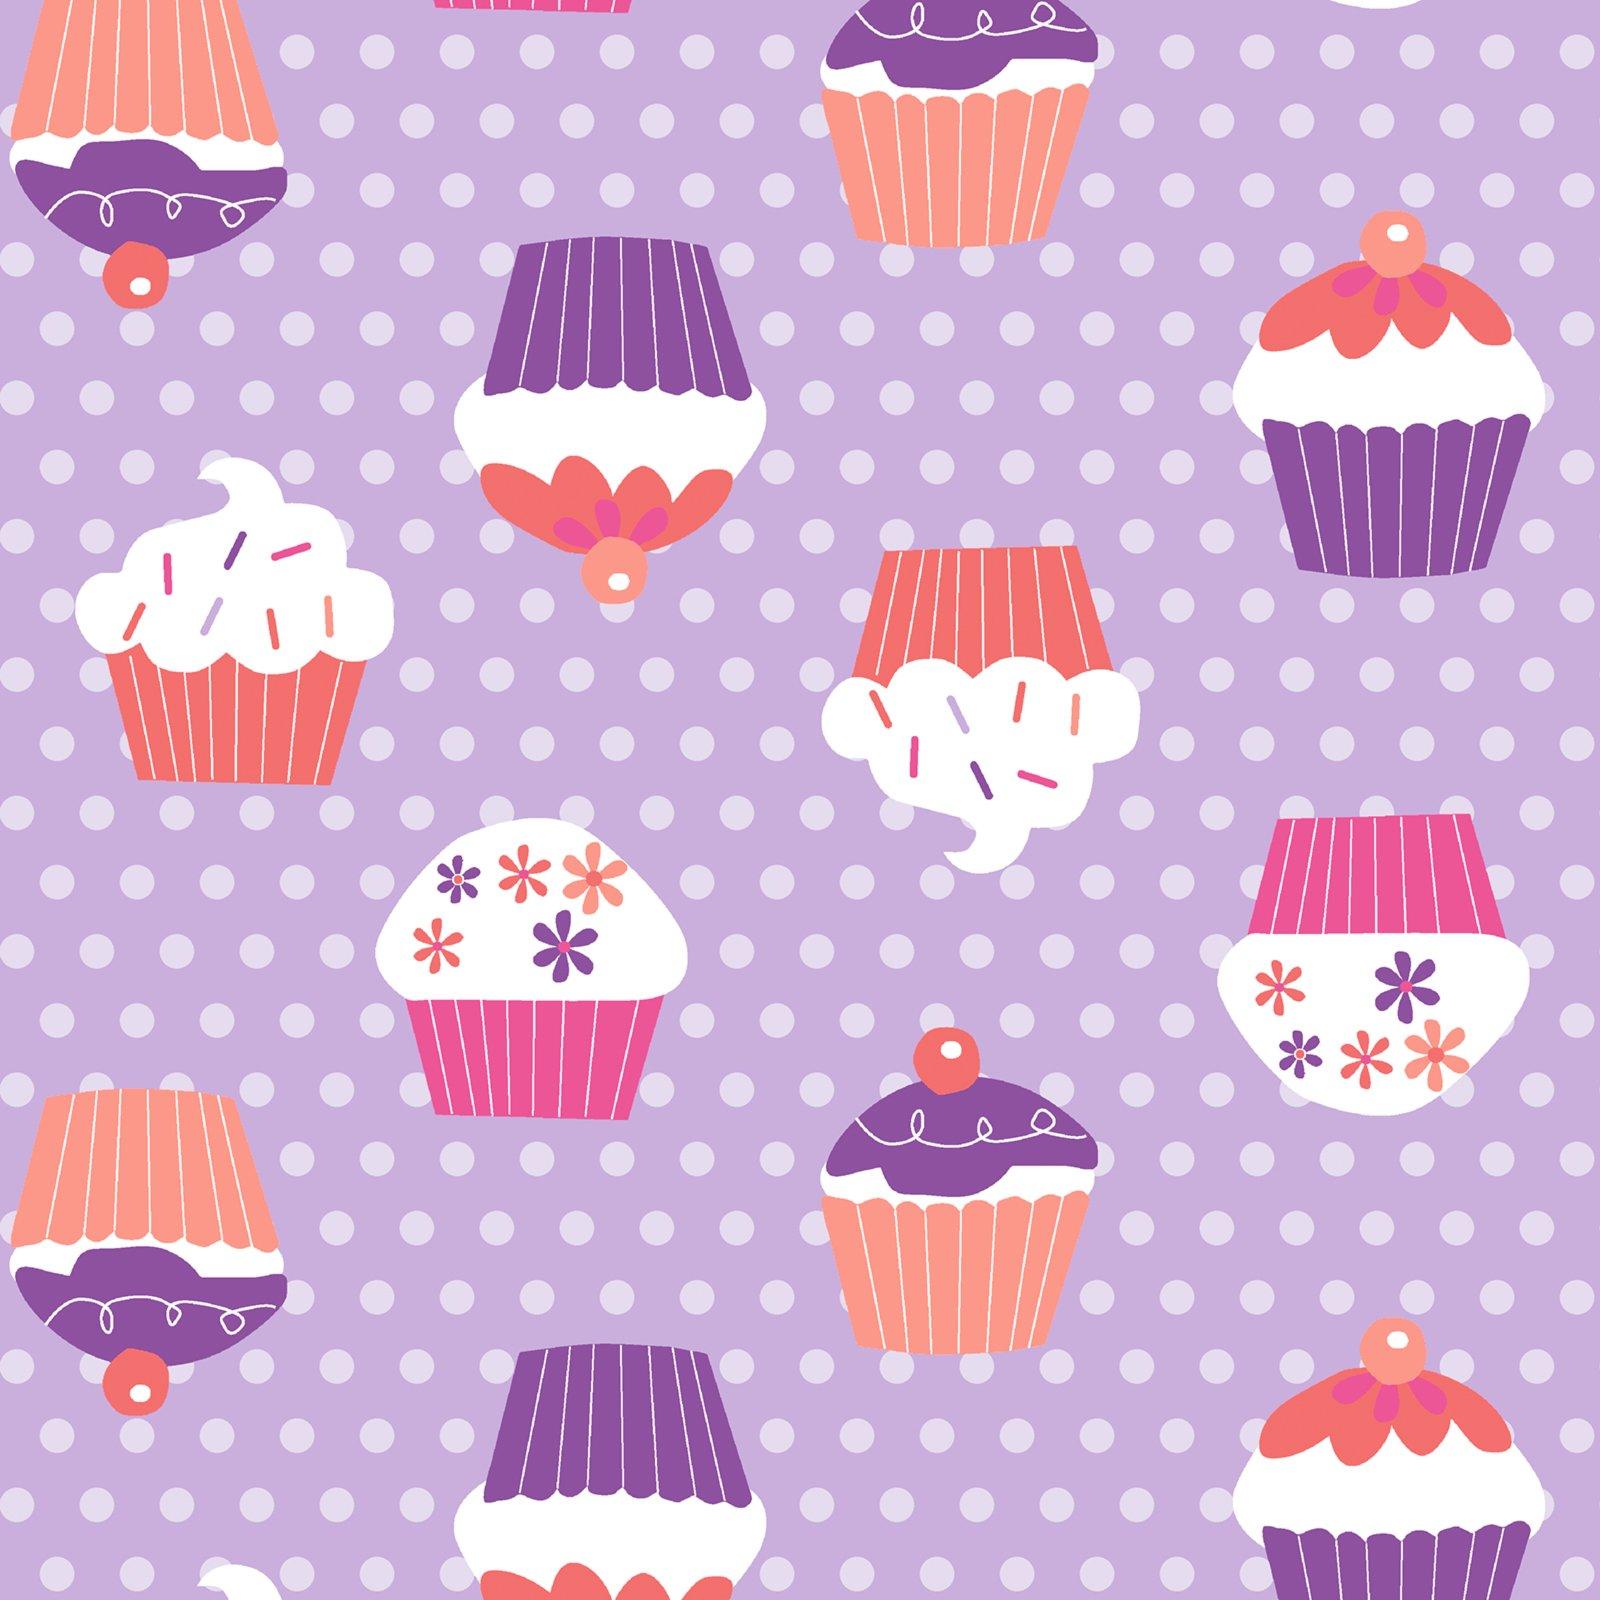 stoff lila cupcakes meterware stoffe meterware heimtextilien deko haushalt. Black Bedroom Furniture Sets. Home Design Ideas